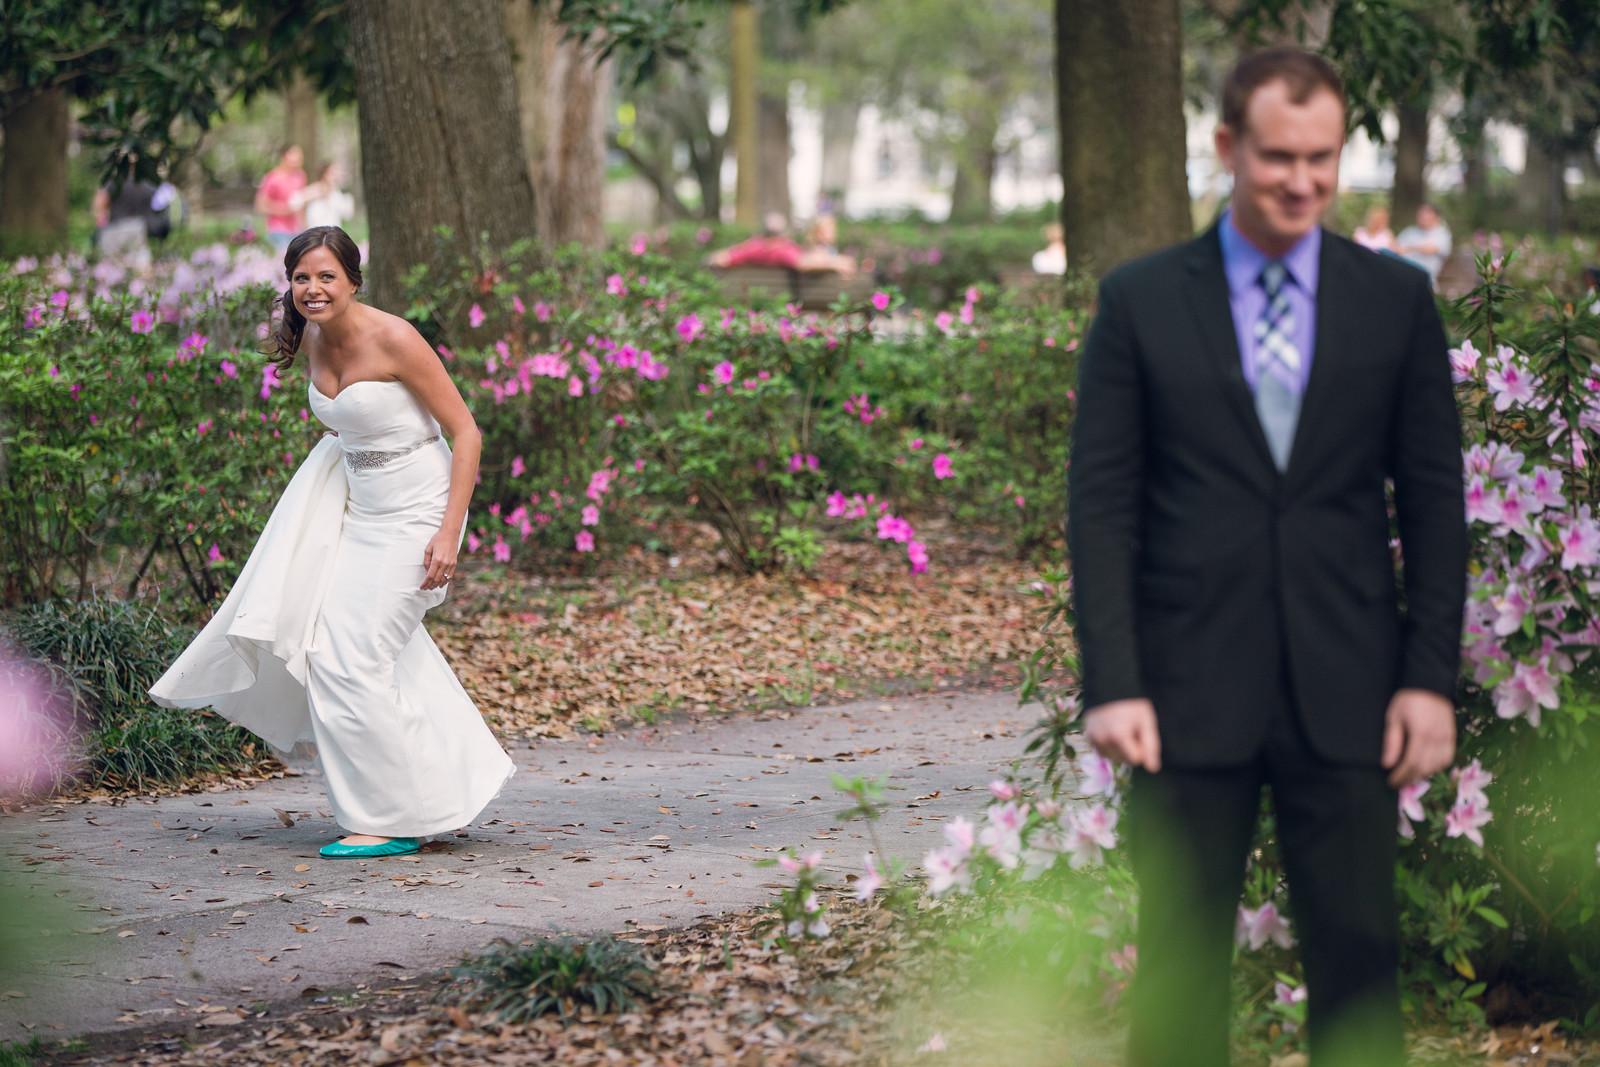 best-first-look-ever-picture-alexis-sweet-photography-savannah-bridal-boutique-savannah-wedding-planner-savannah-wedding-dresses-dakota-nicole-miller-wedding-dress.jpg